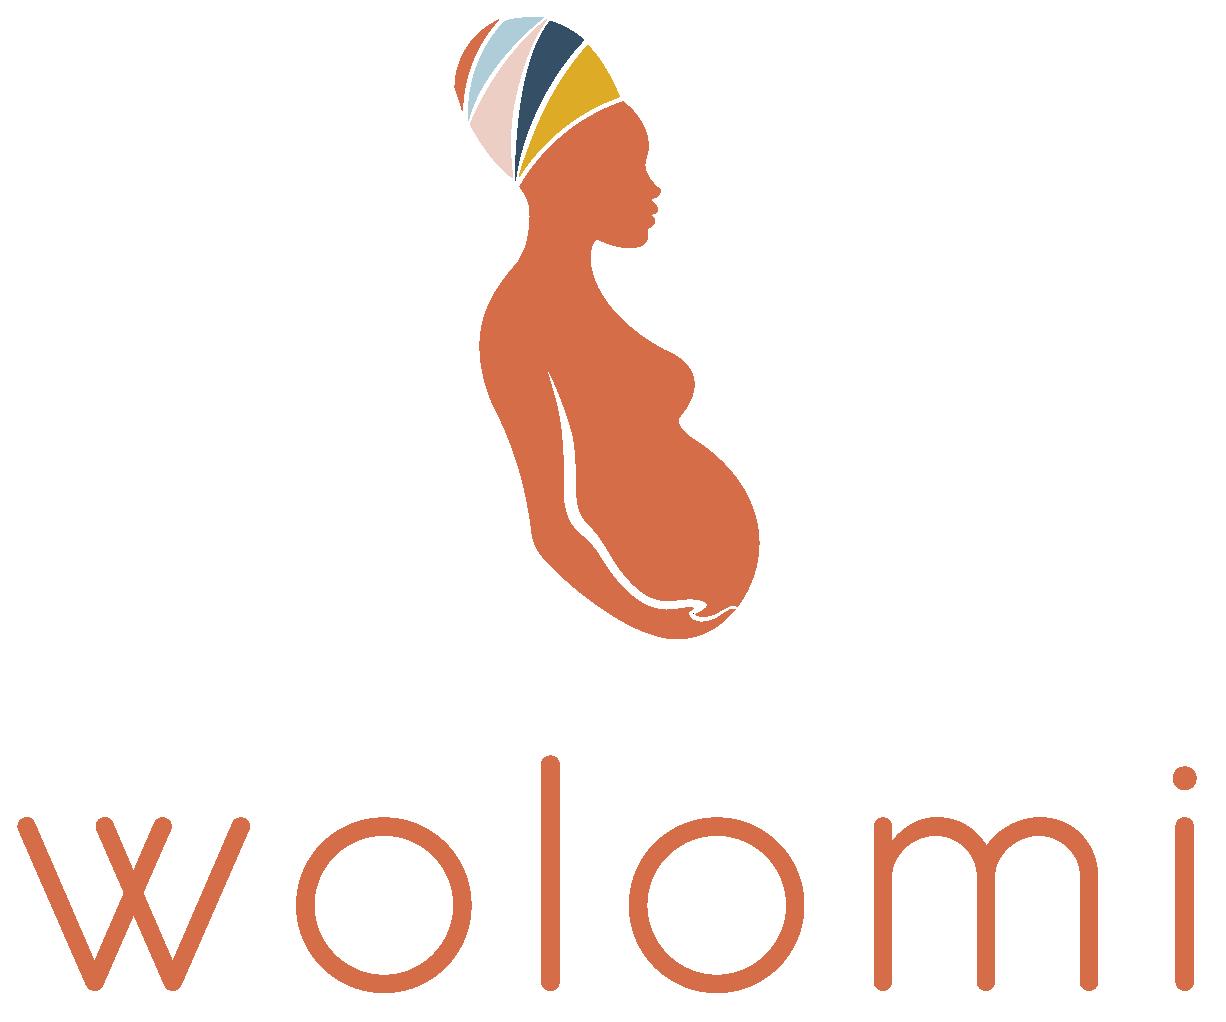 Wolomi-Combine Color.png